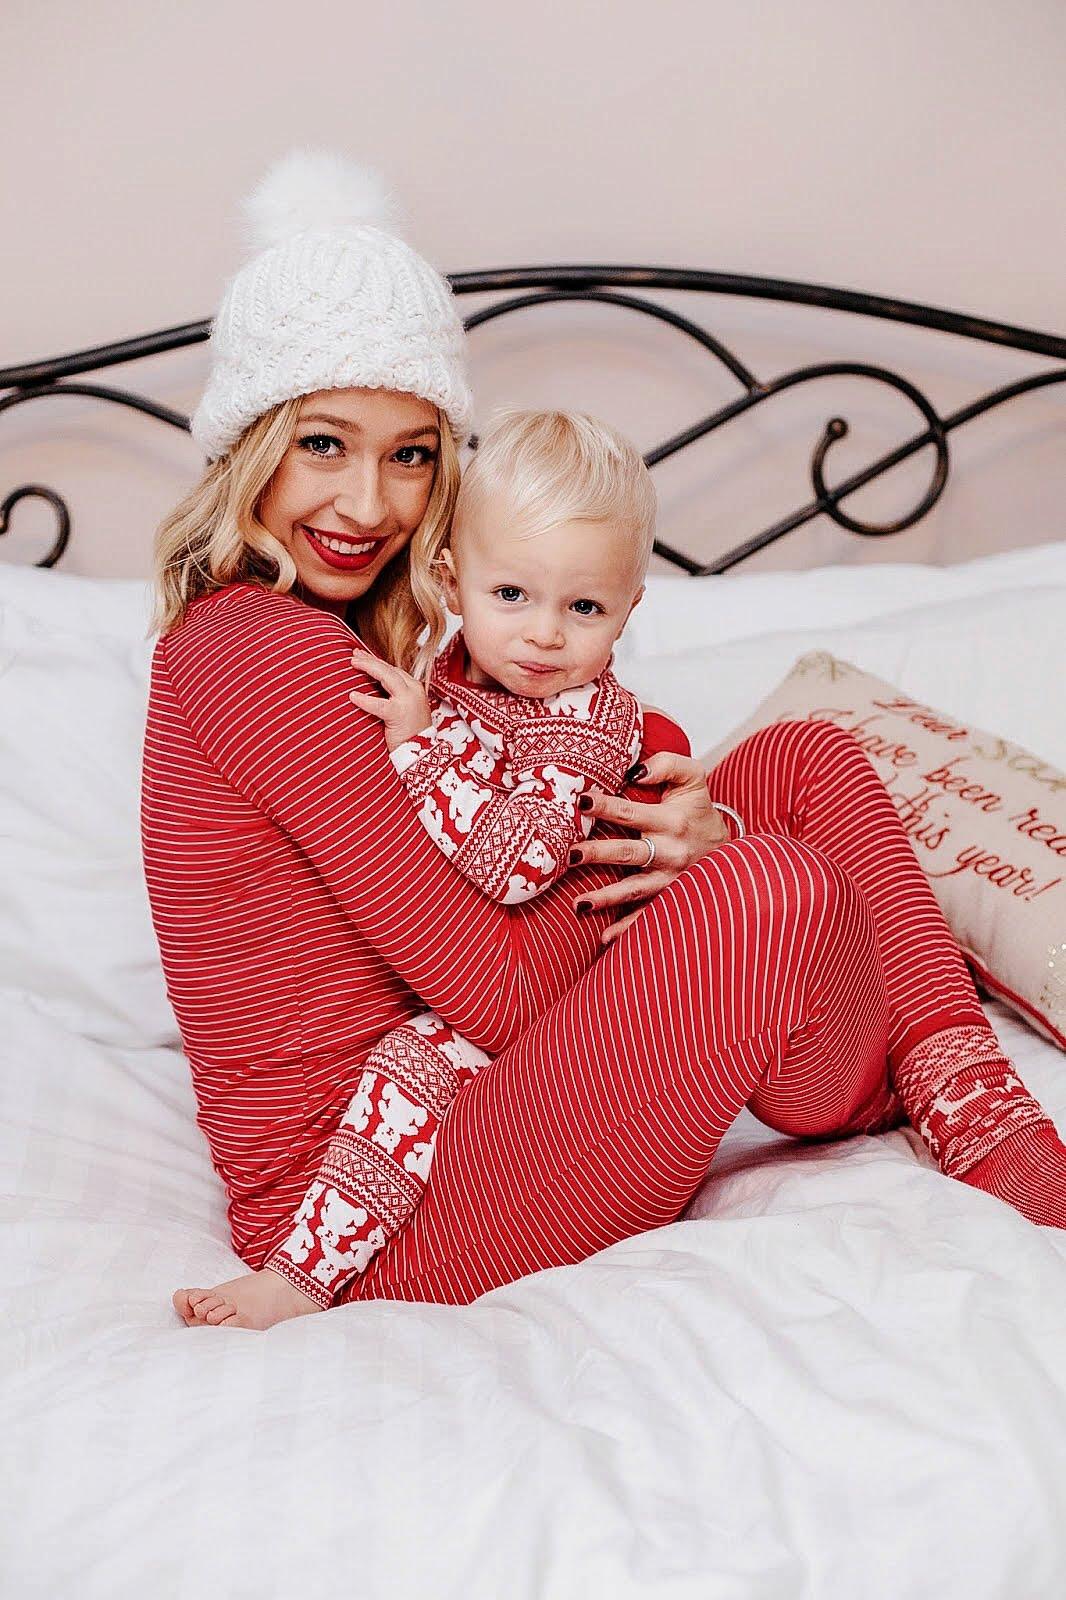 Her Name Is Sylvia  Christmas Pajamas - FOR THE WHOLE FAMILY edc767e25